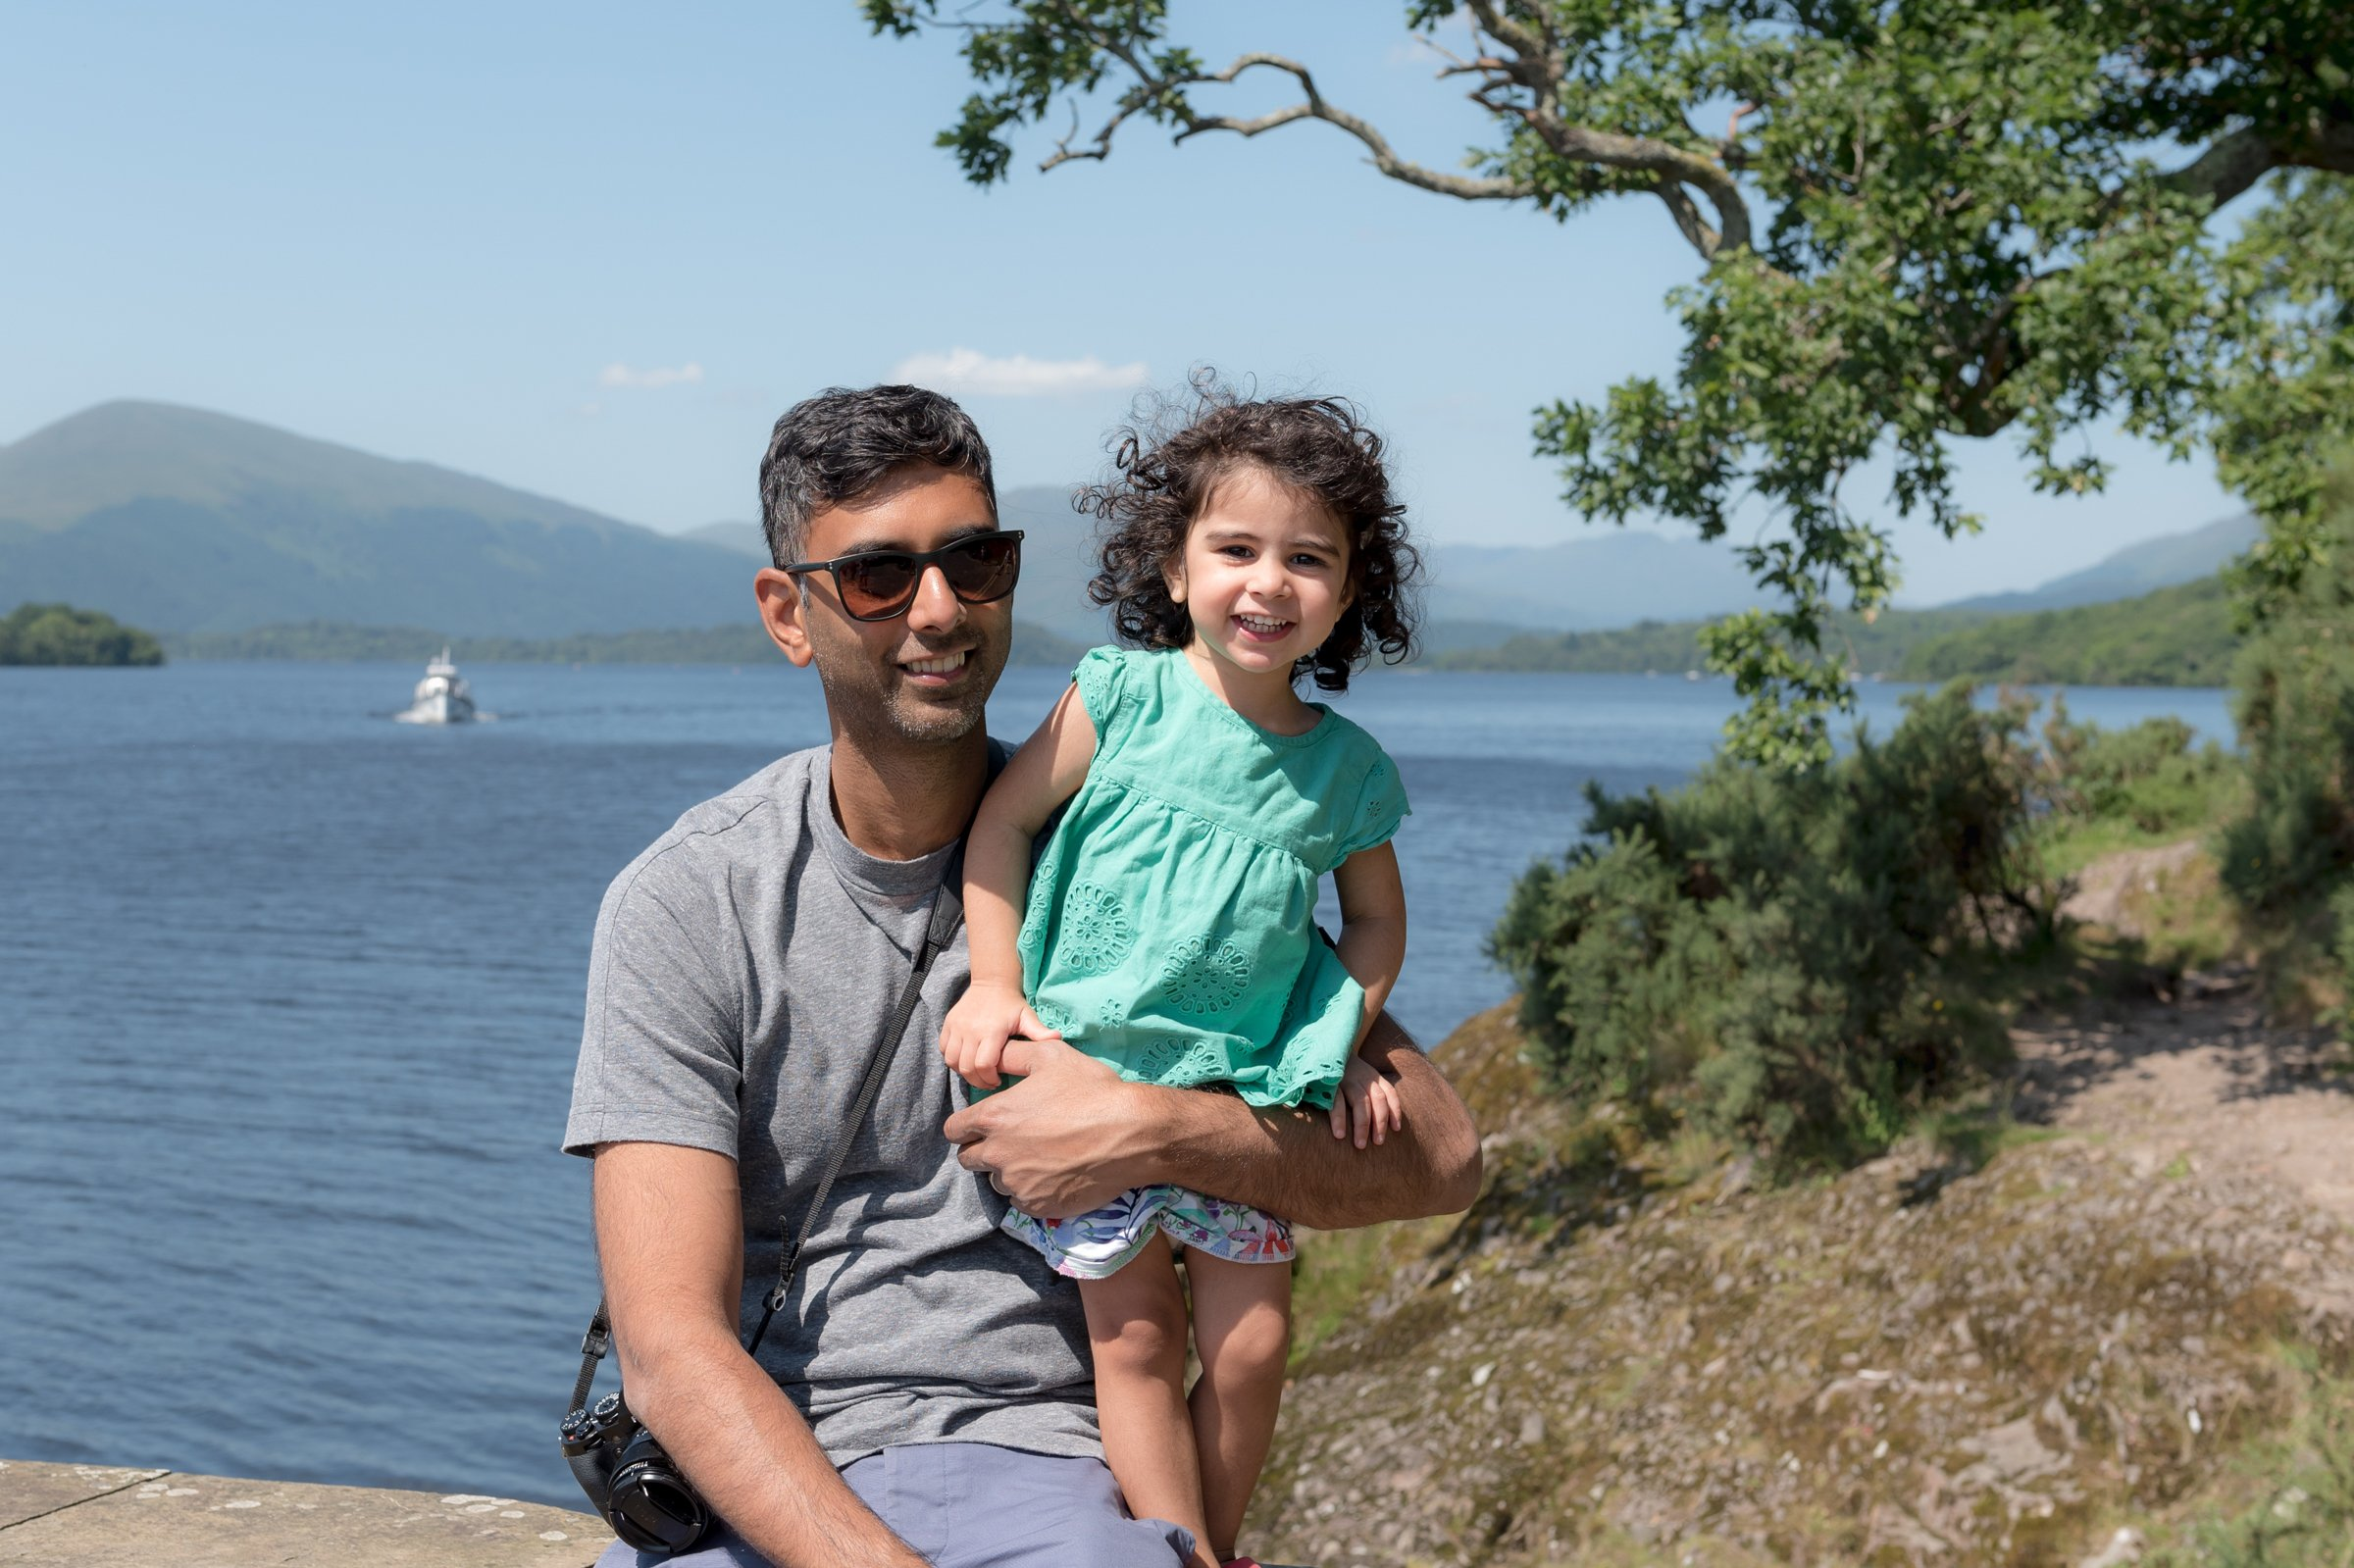 Kid Friendly Travel on Loch Lomond, Scotland